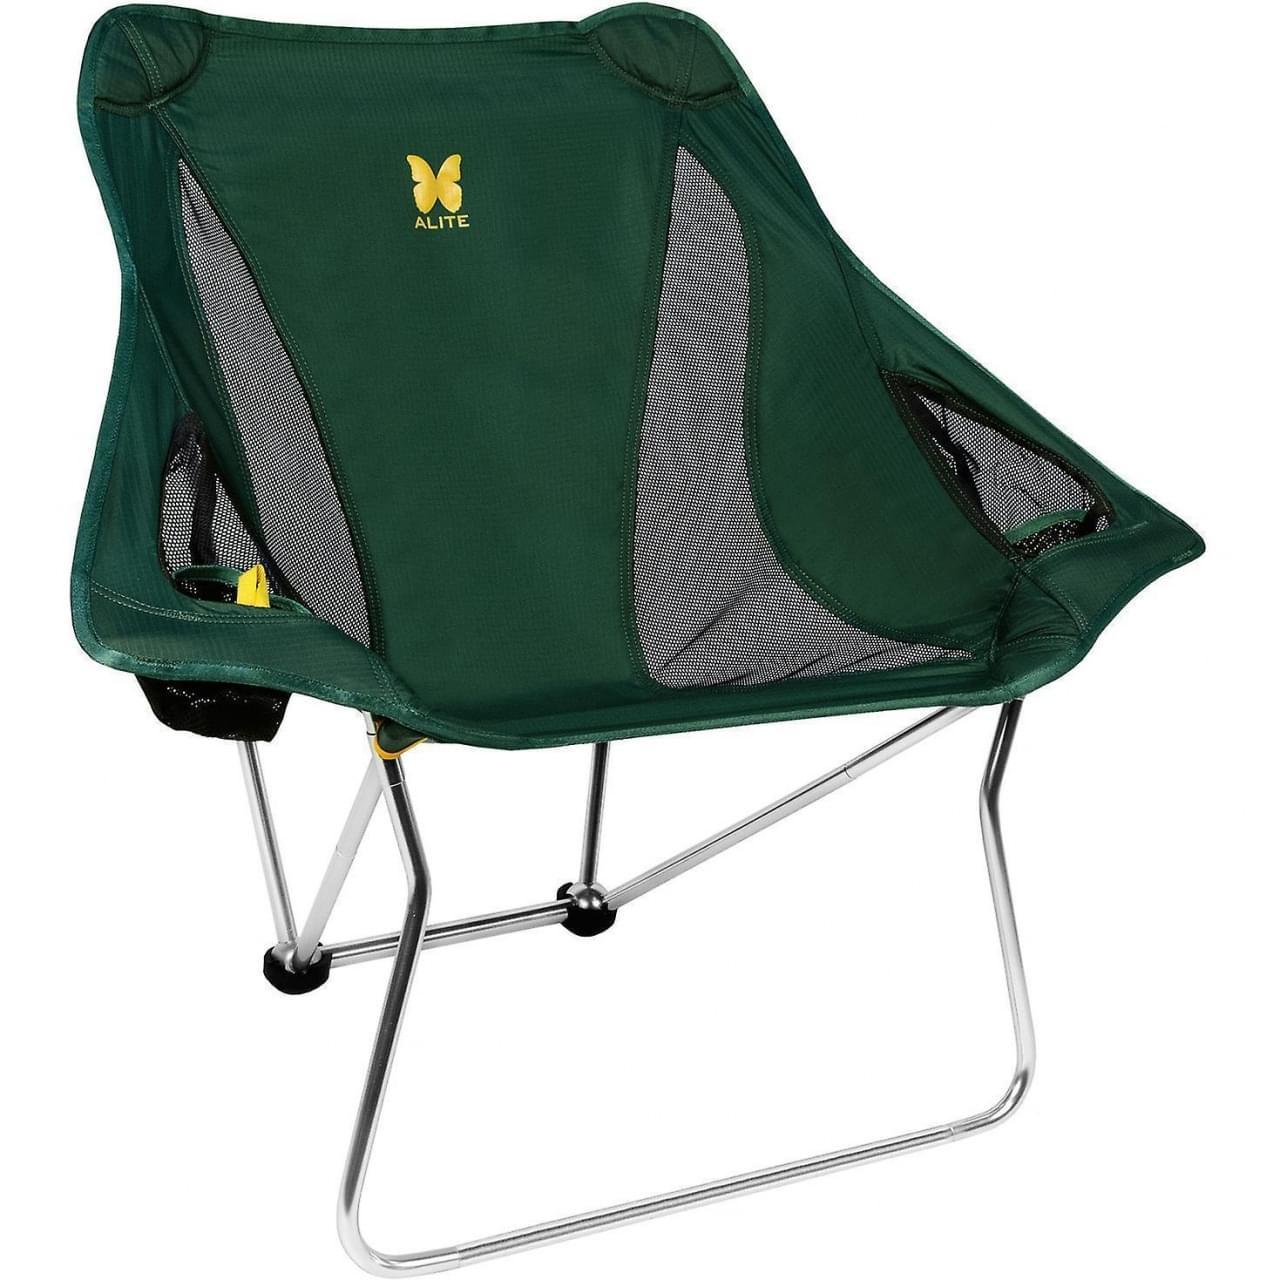 Alite Stonefly Chair Lichtgewicht Stoel